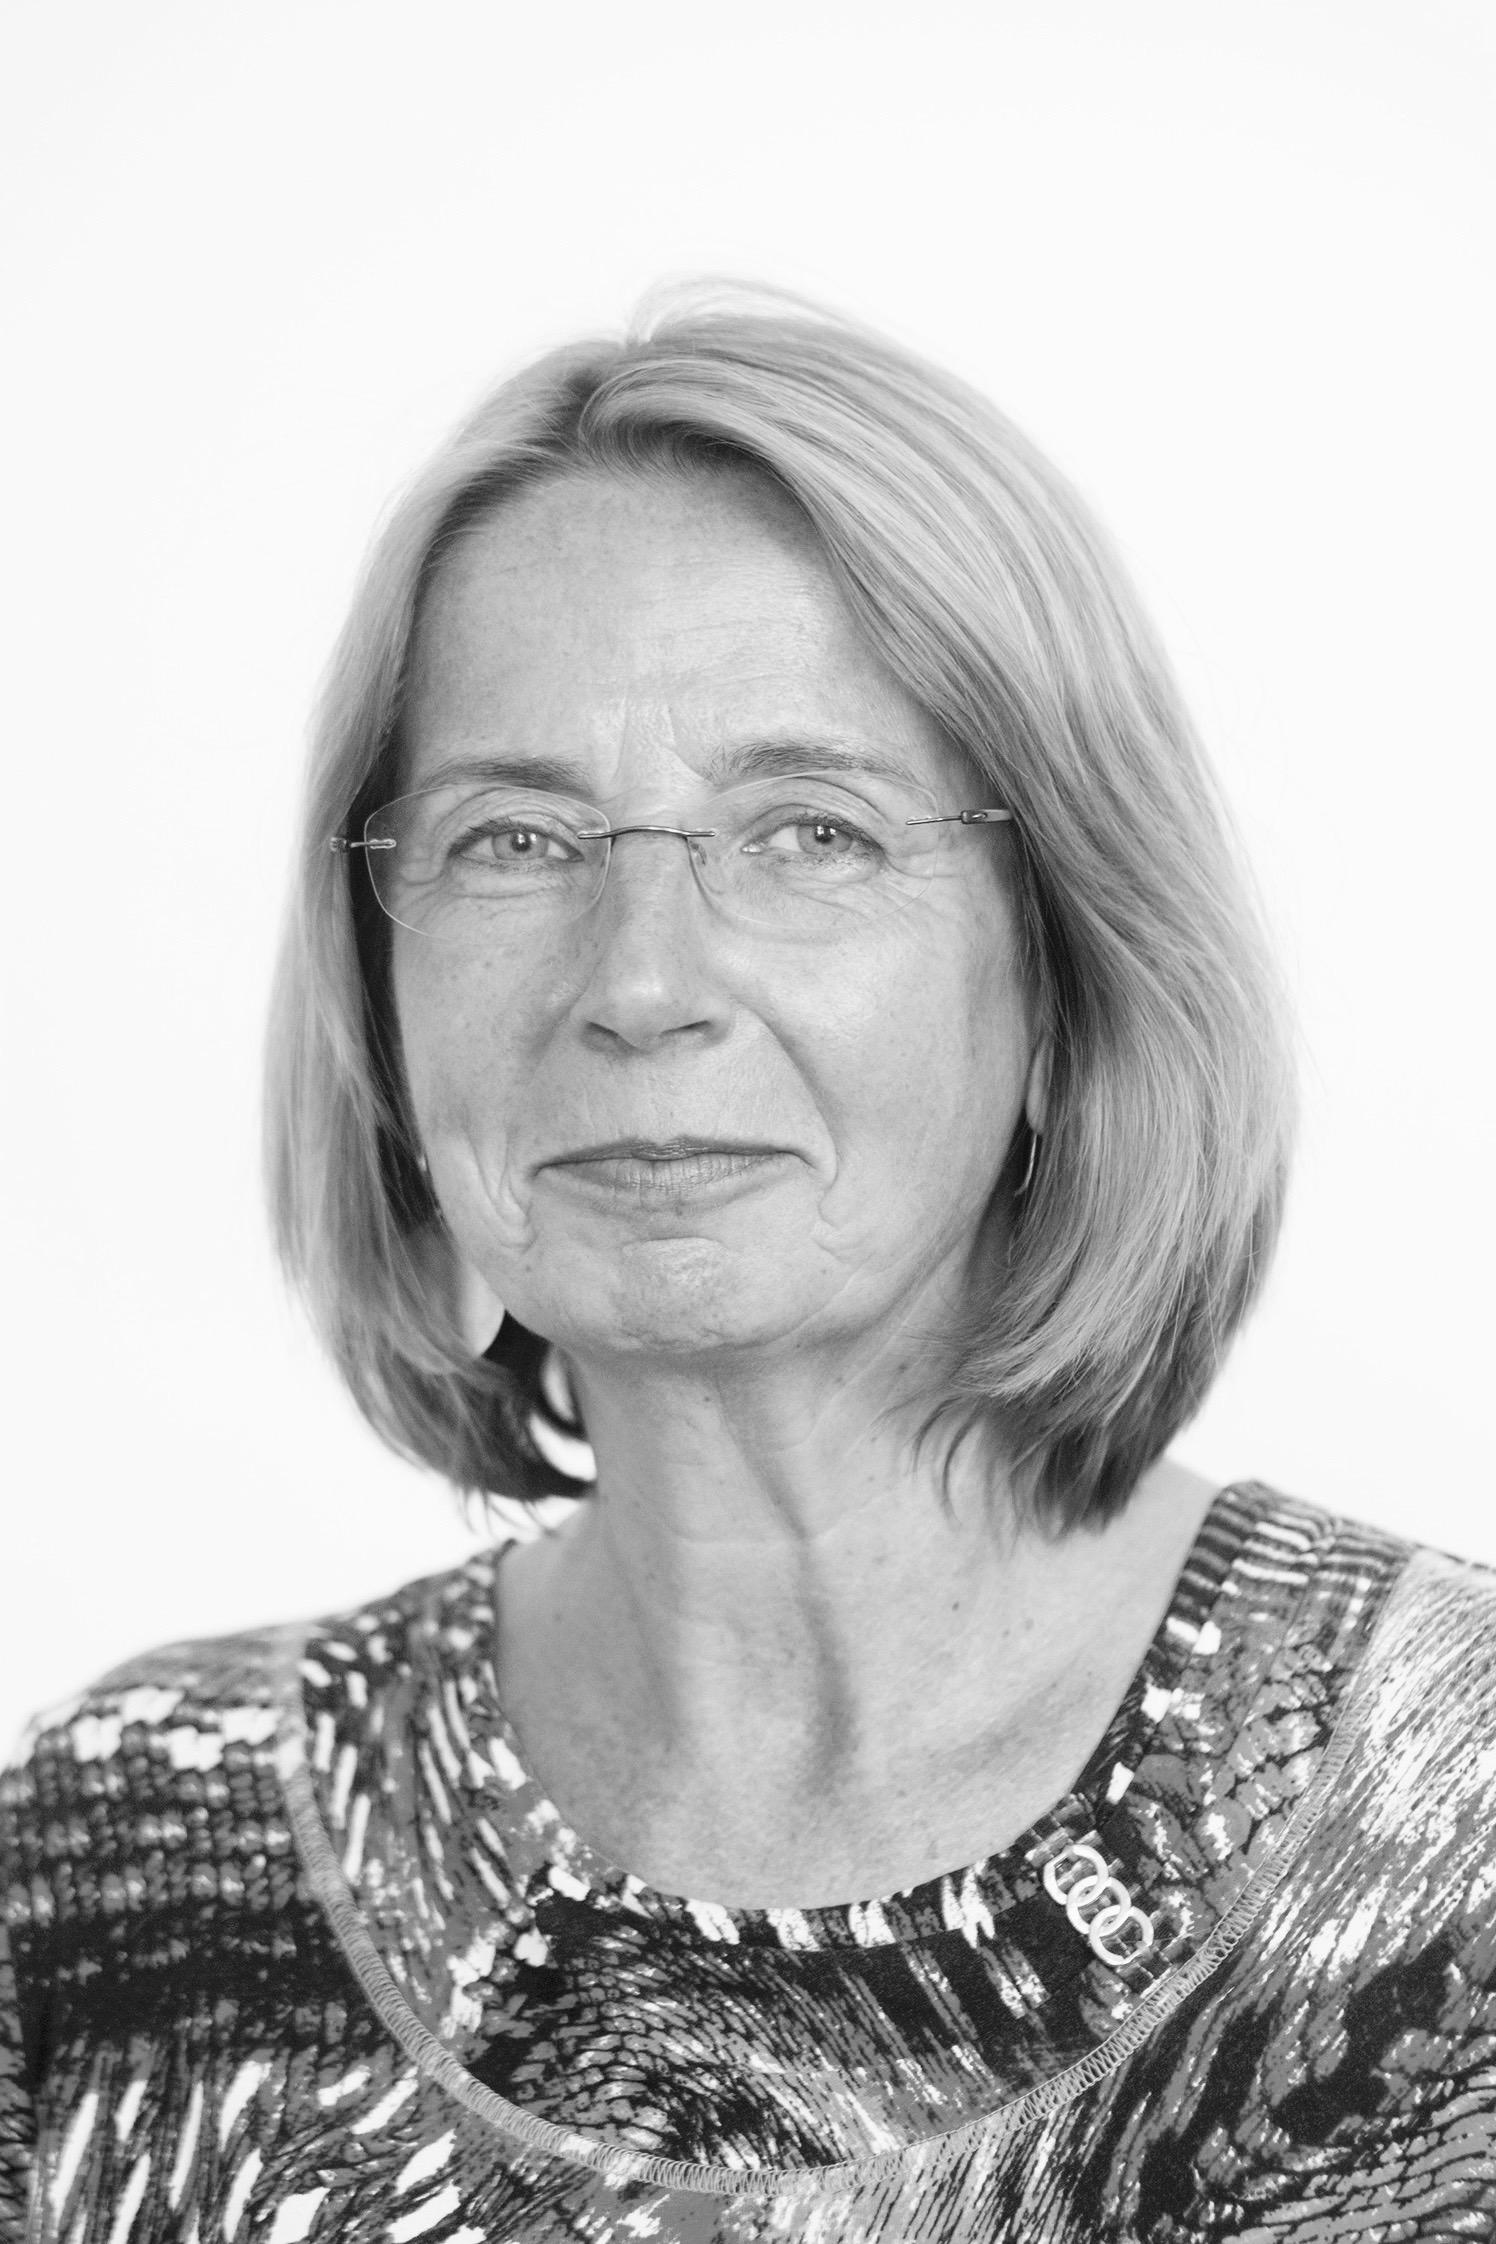 Kerstin Engelhardt